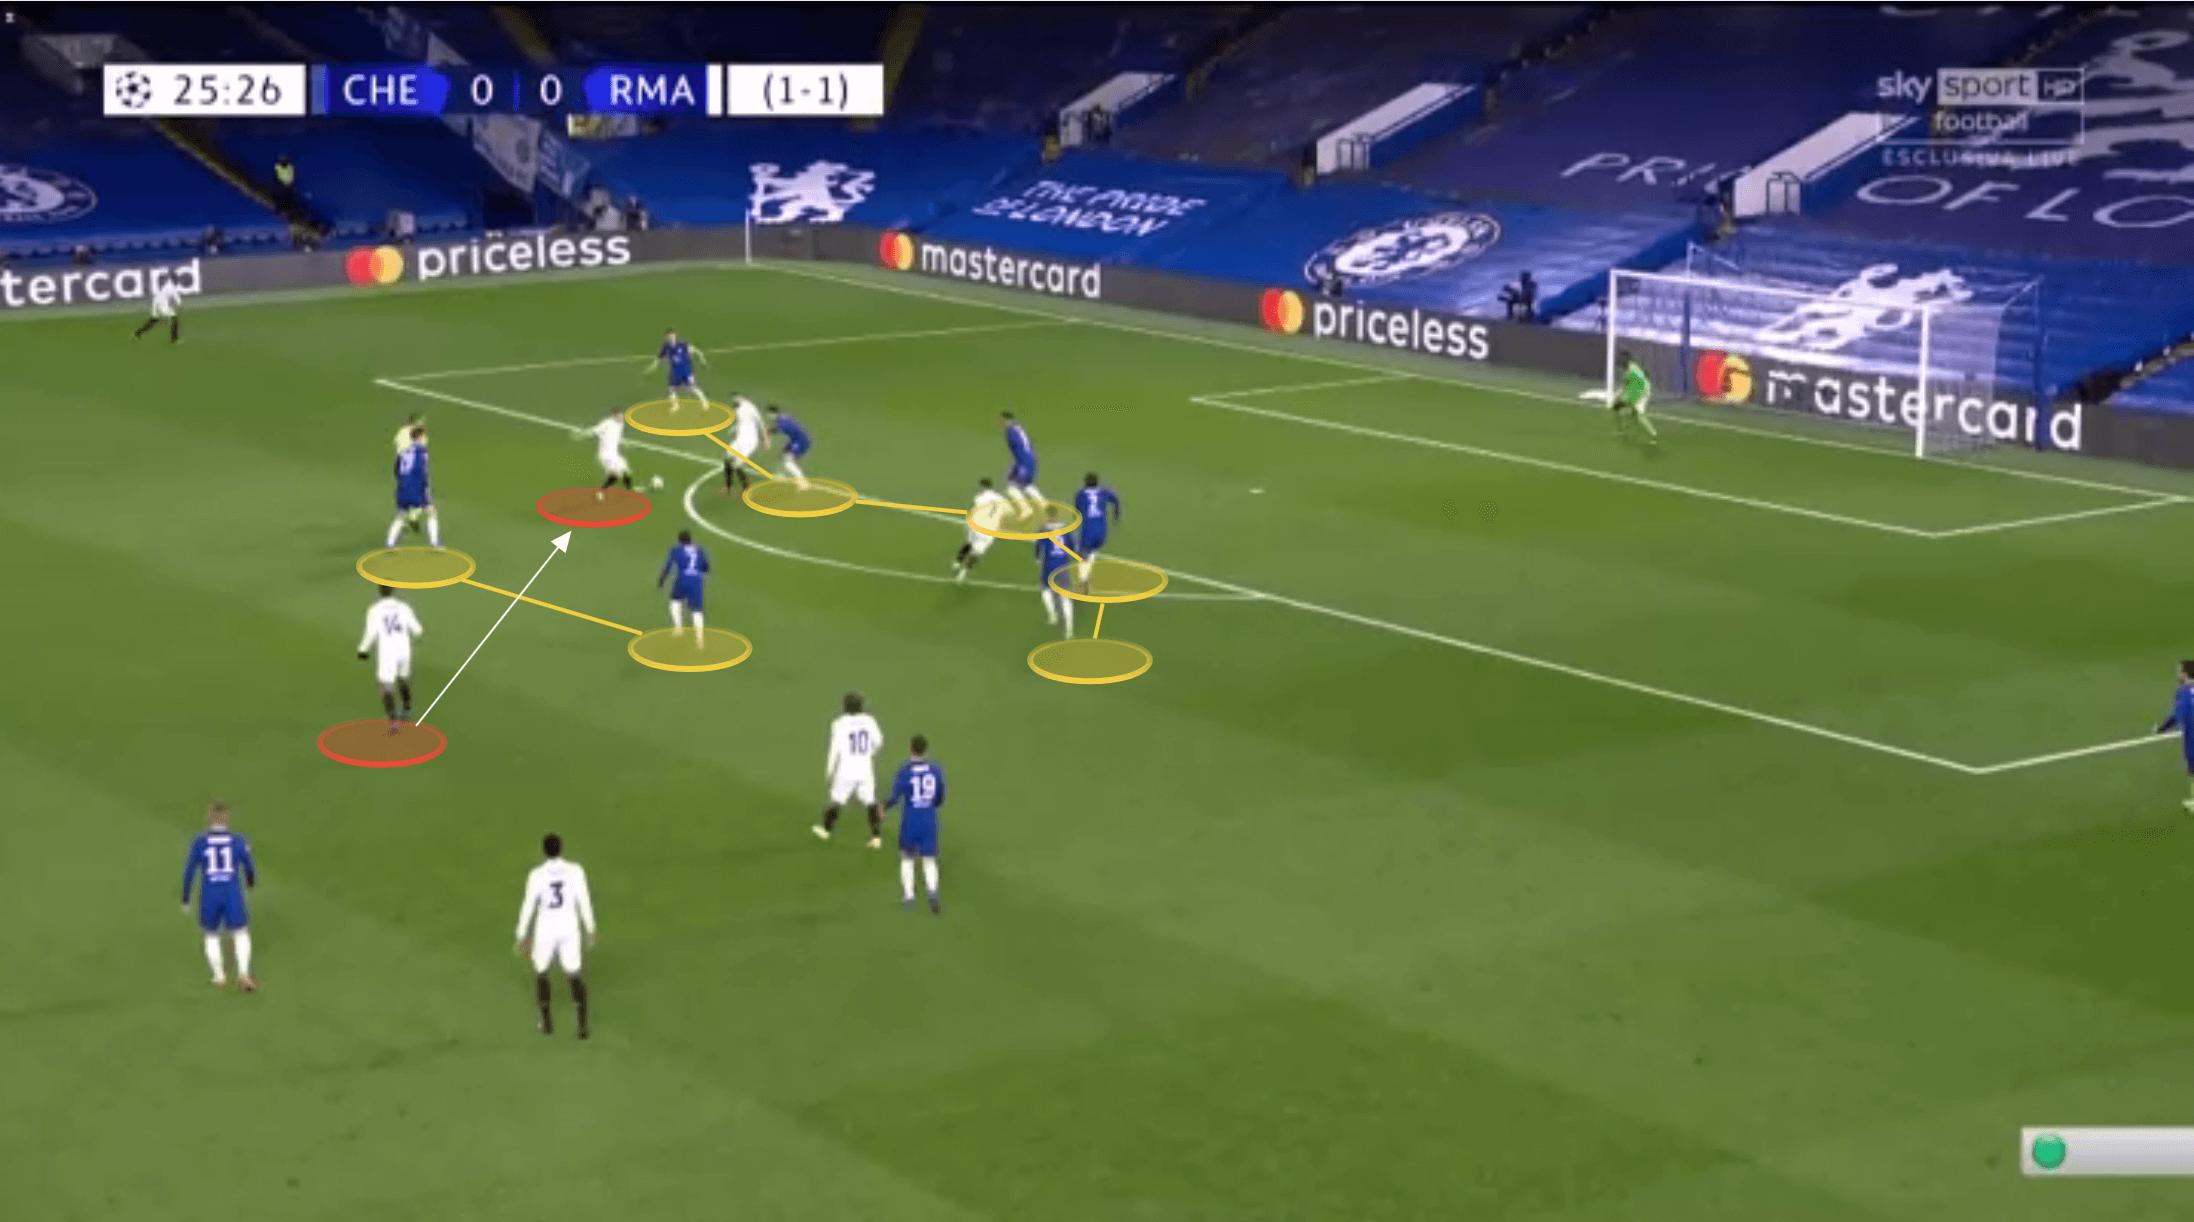 UEFA Champions League 2020/21: Chelsea vs Real Madrid - tactical analysis tactics